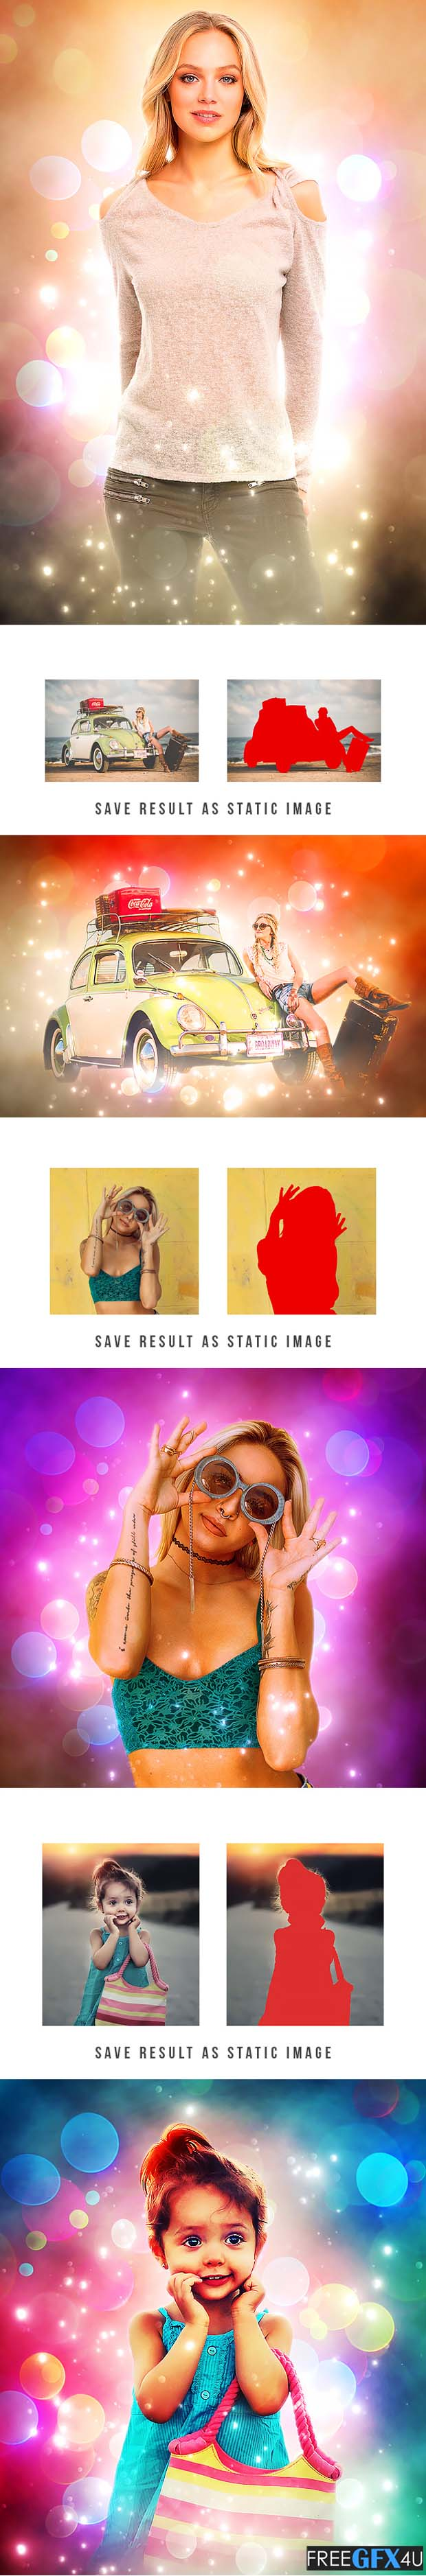 Graphicriver - Magic Bokeh Animated Photoshop Action